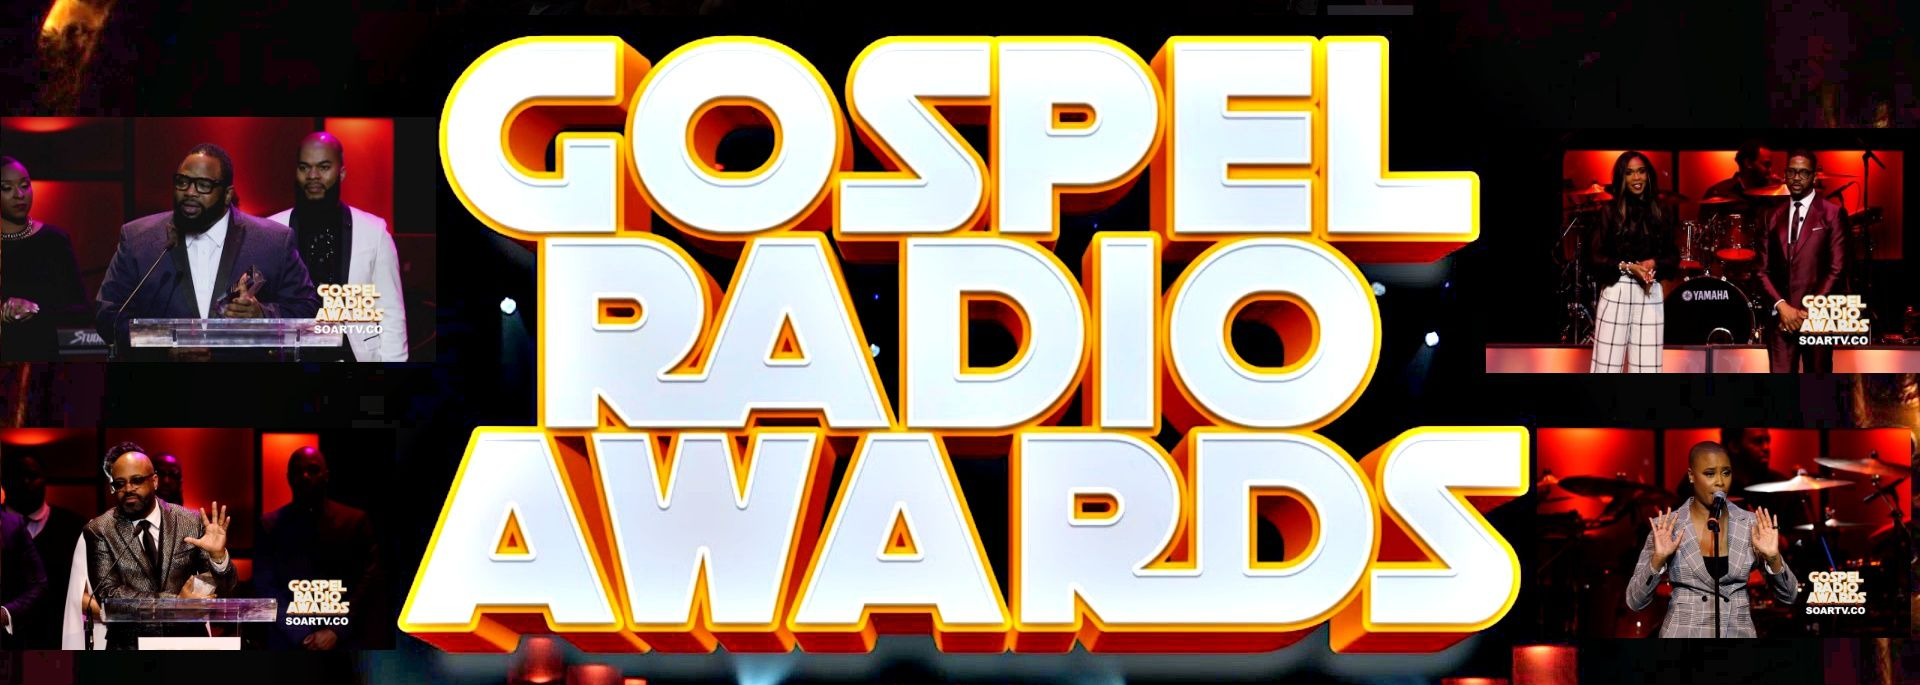 Gospel Radio Awards